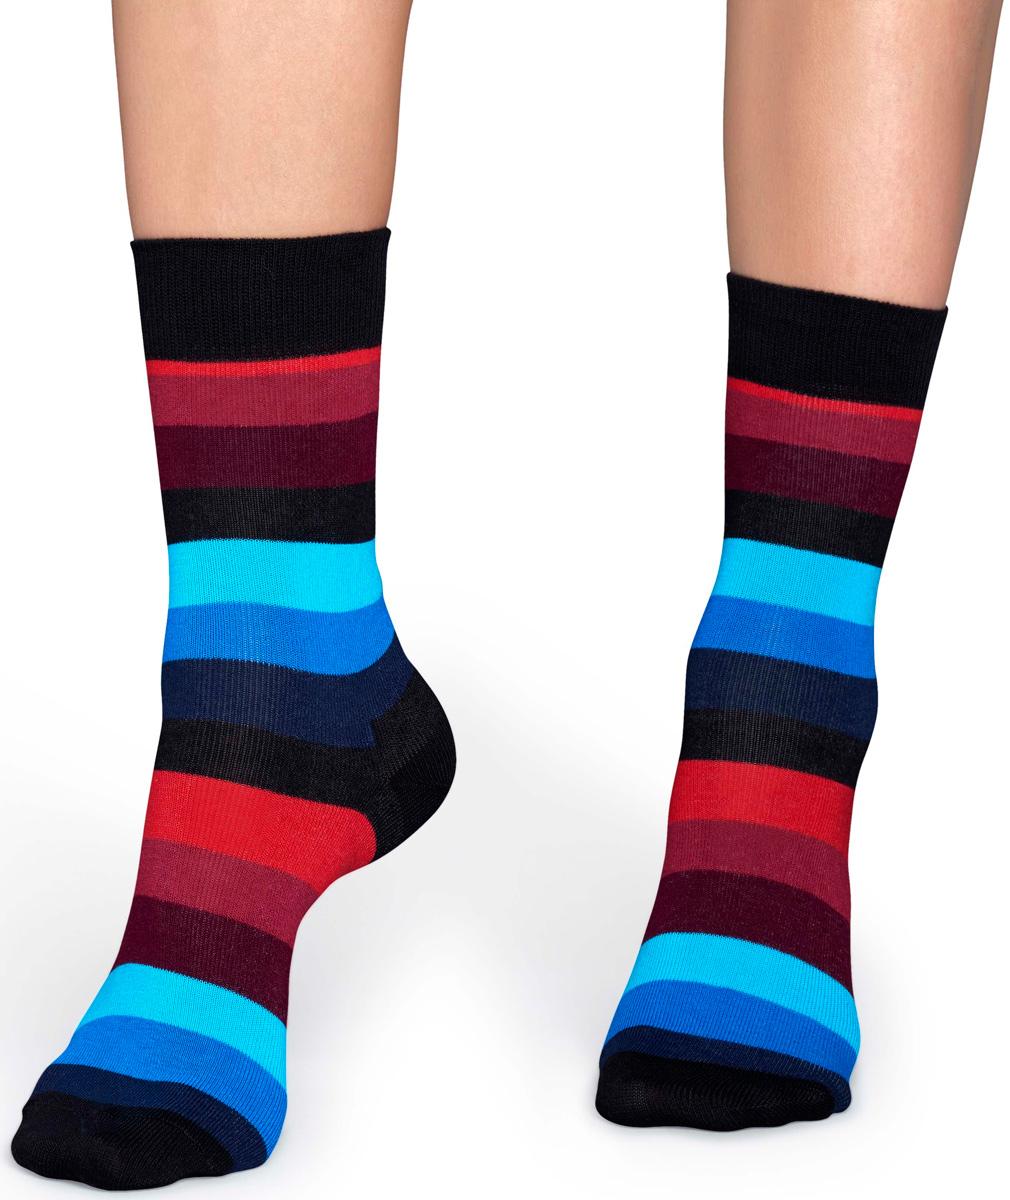 Носки мужские Happy socks, цвет: черный, мультиколор. SA01. Размер 29SA01